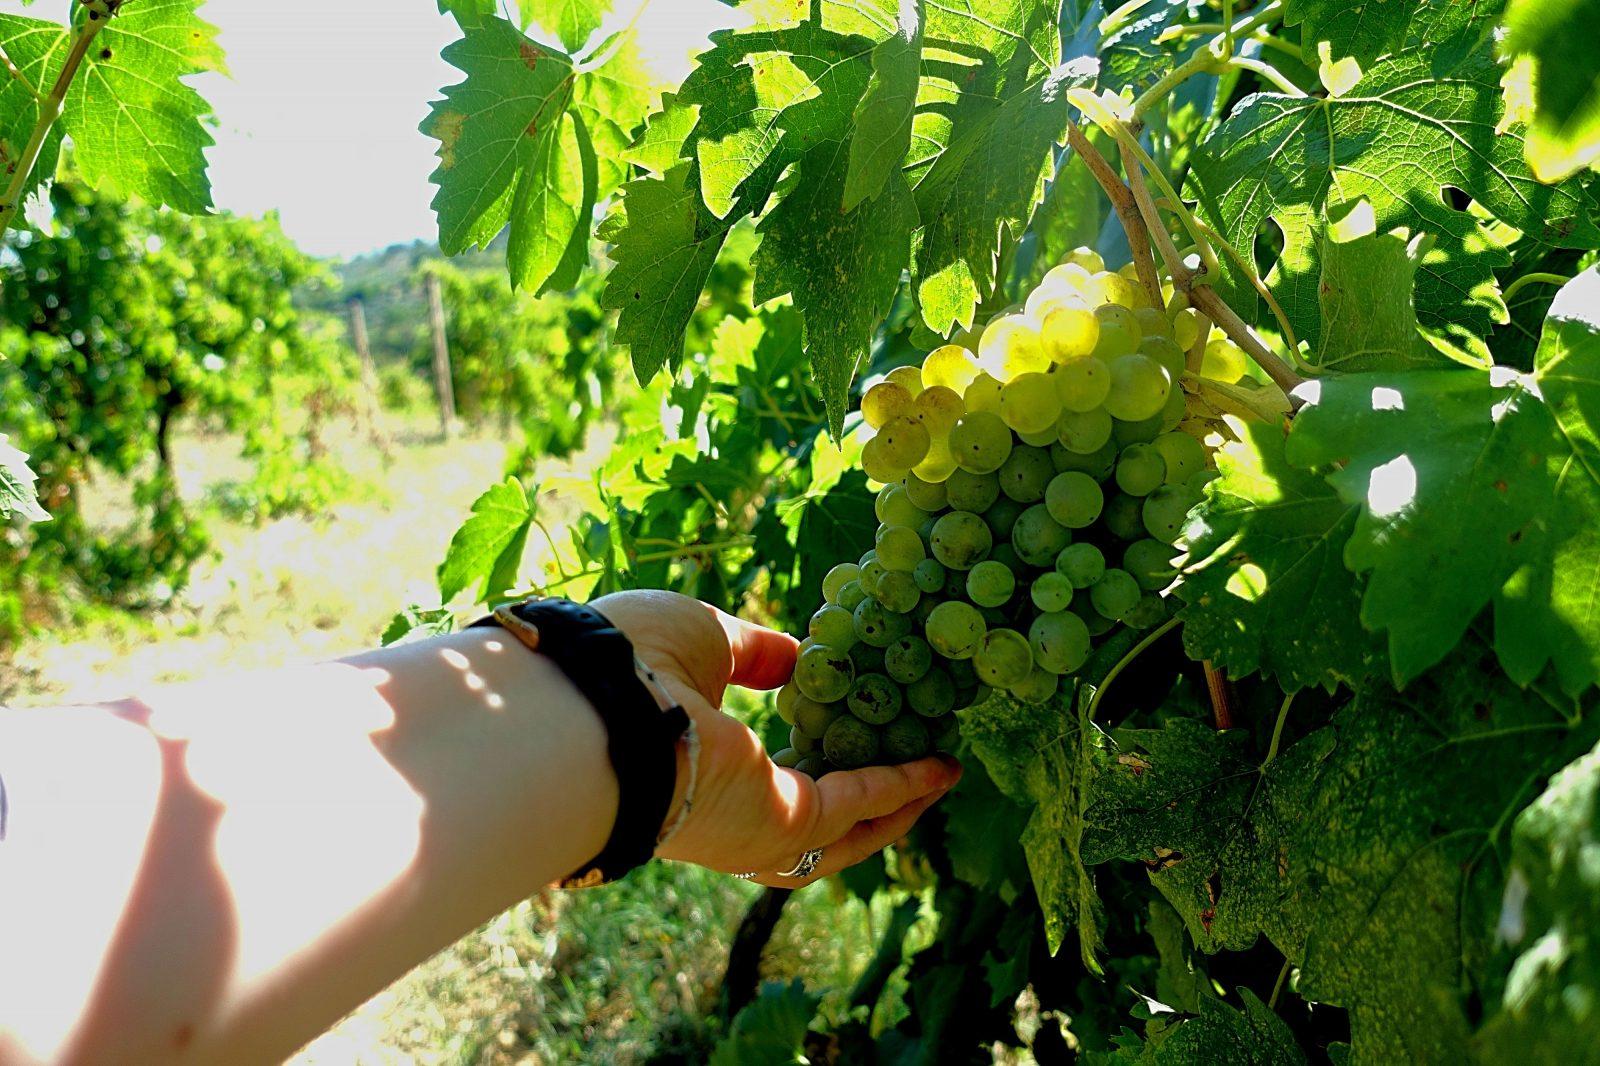 podere la marronaia vernaccia grapes - La Marronaia - amphora wine